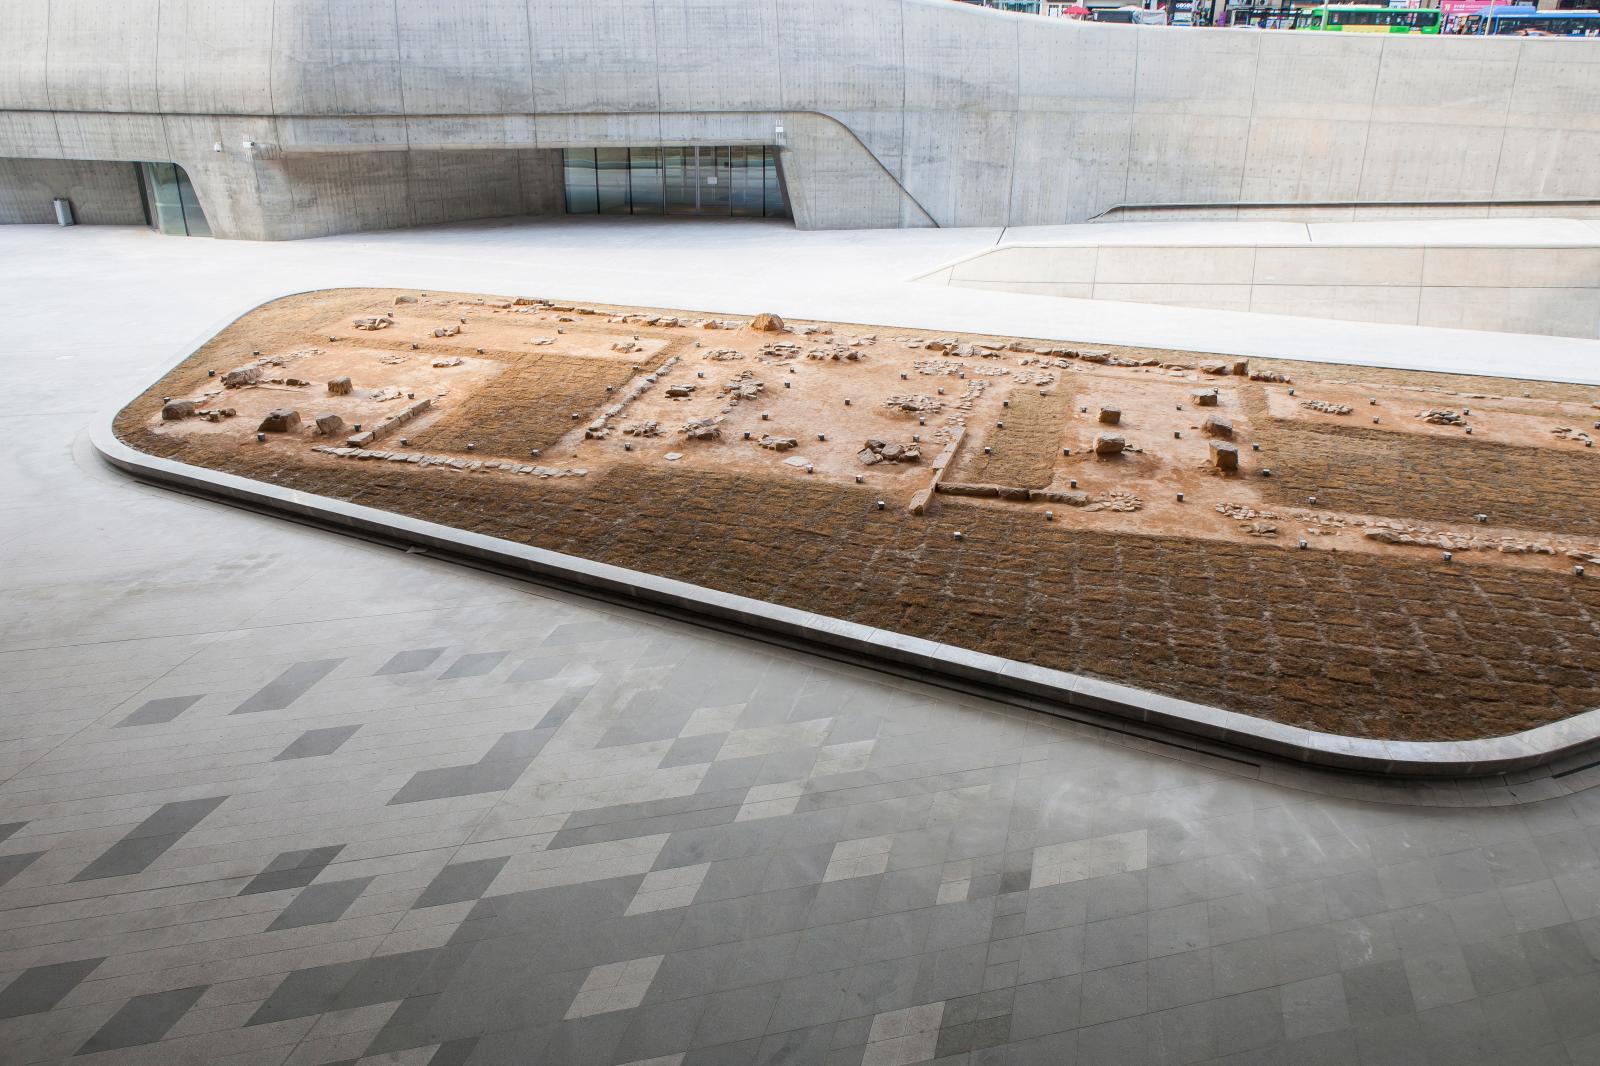 Zone archéologique, Oullim Square, Dongdaemun Design Plaza, DDP.